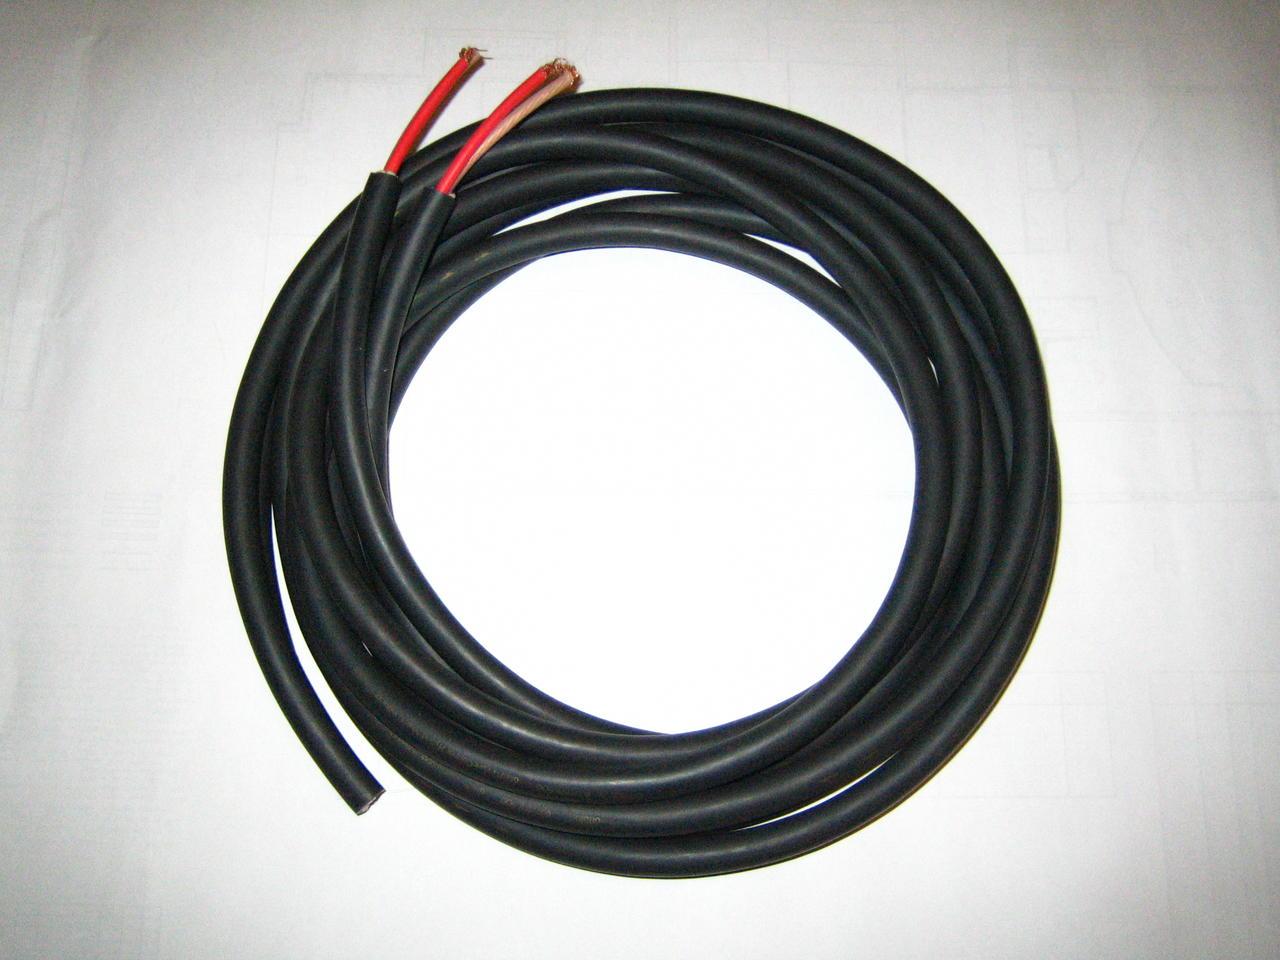 Акустические кабеля (Saec Triple-C, Ortofon, Acroteс, Audio-Technica)